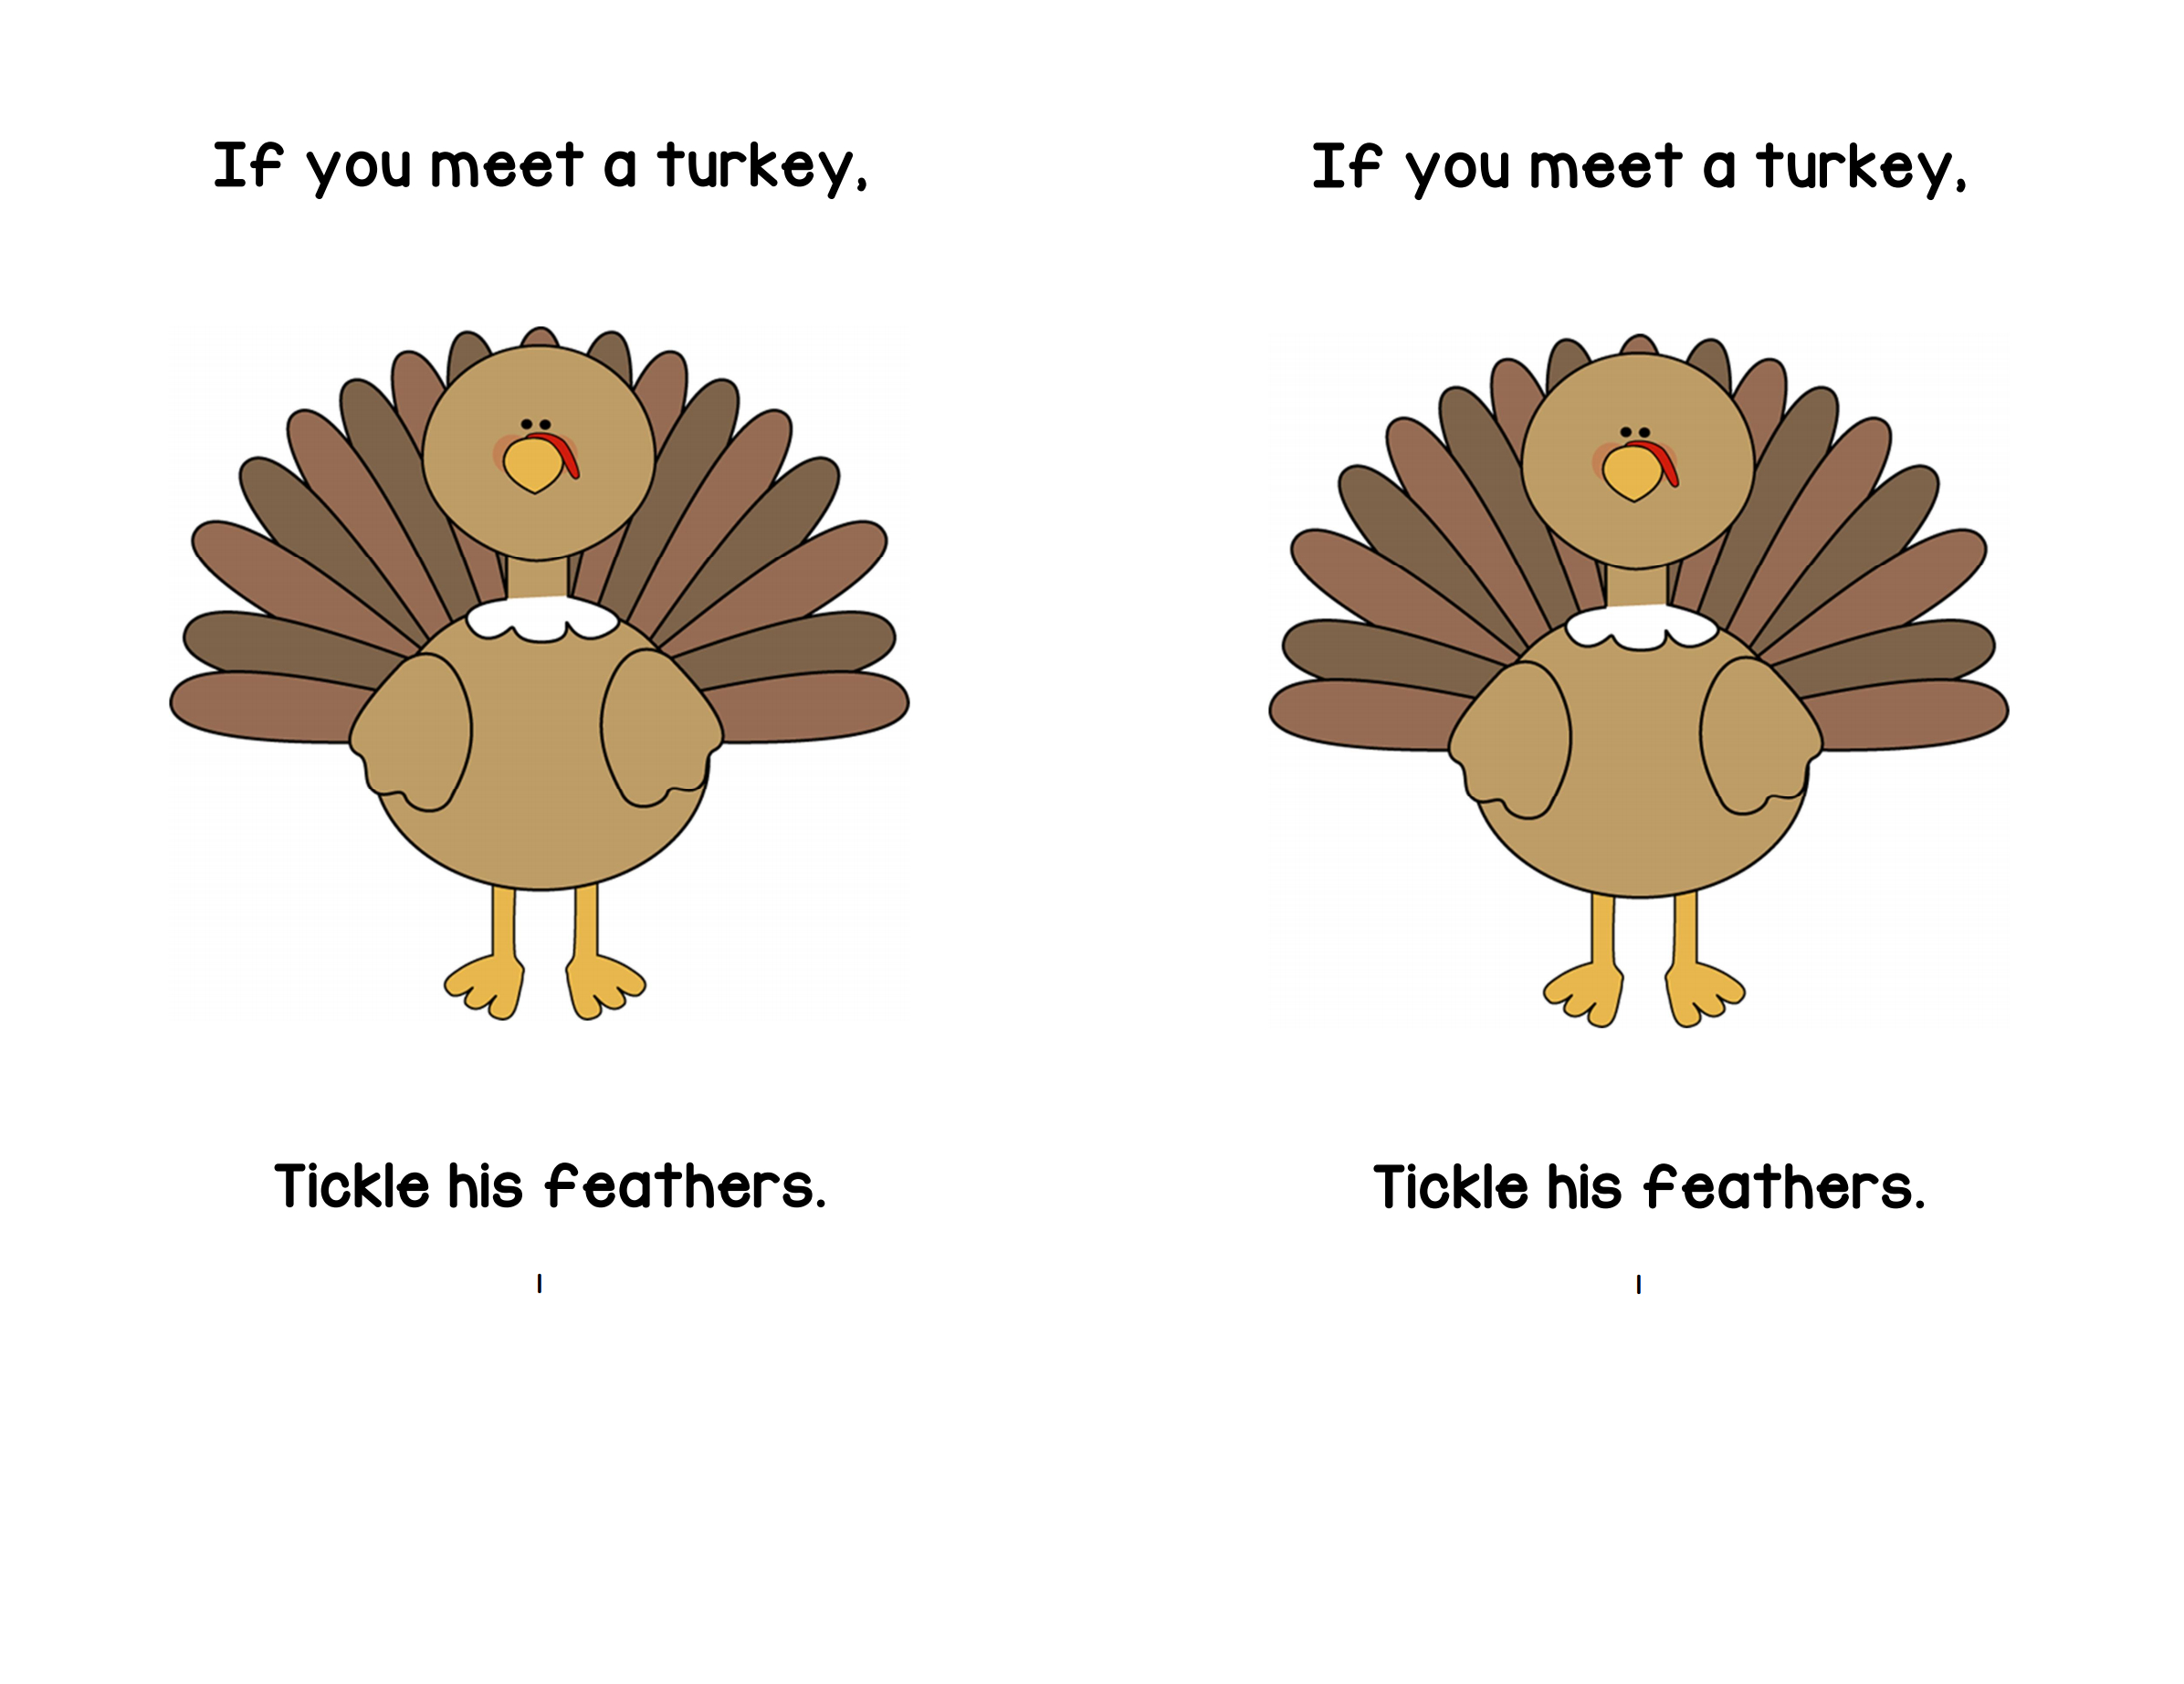 If You Meet A Turkey Printable Book | A To Z Teacher Stuff Printable - Thanksgiving Printable Books Free